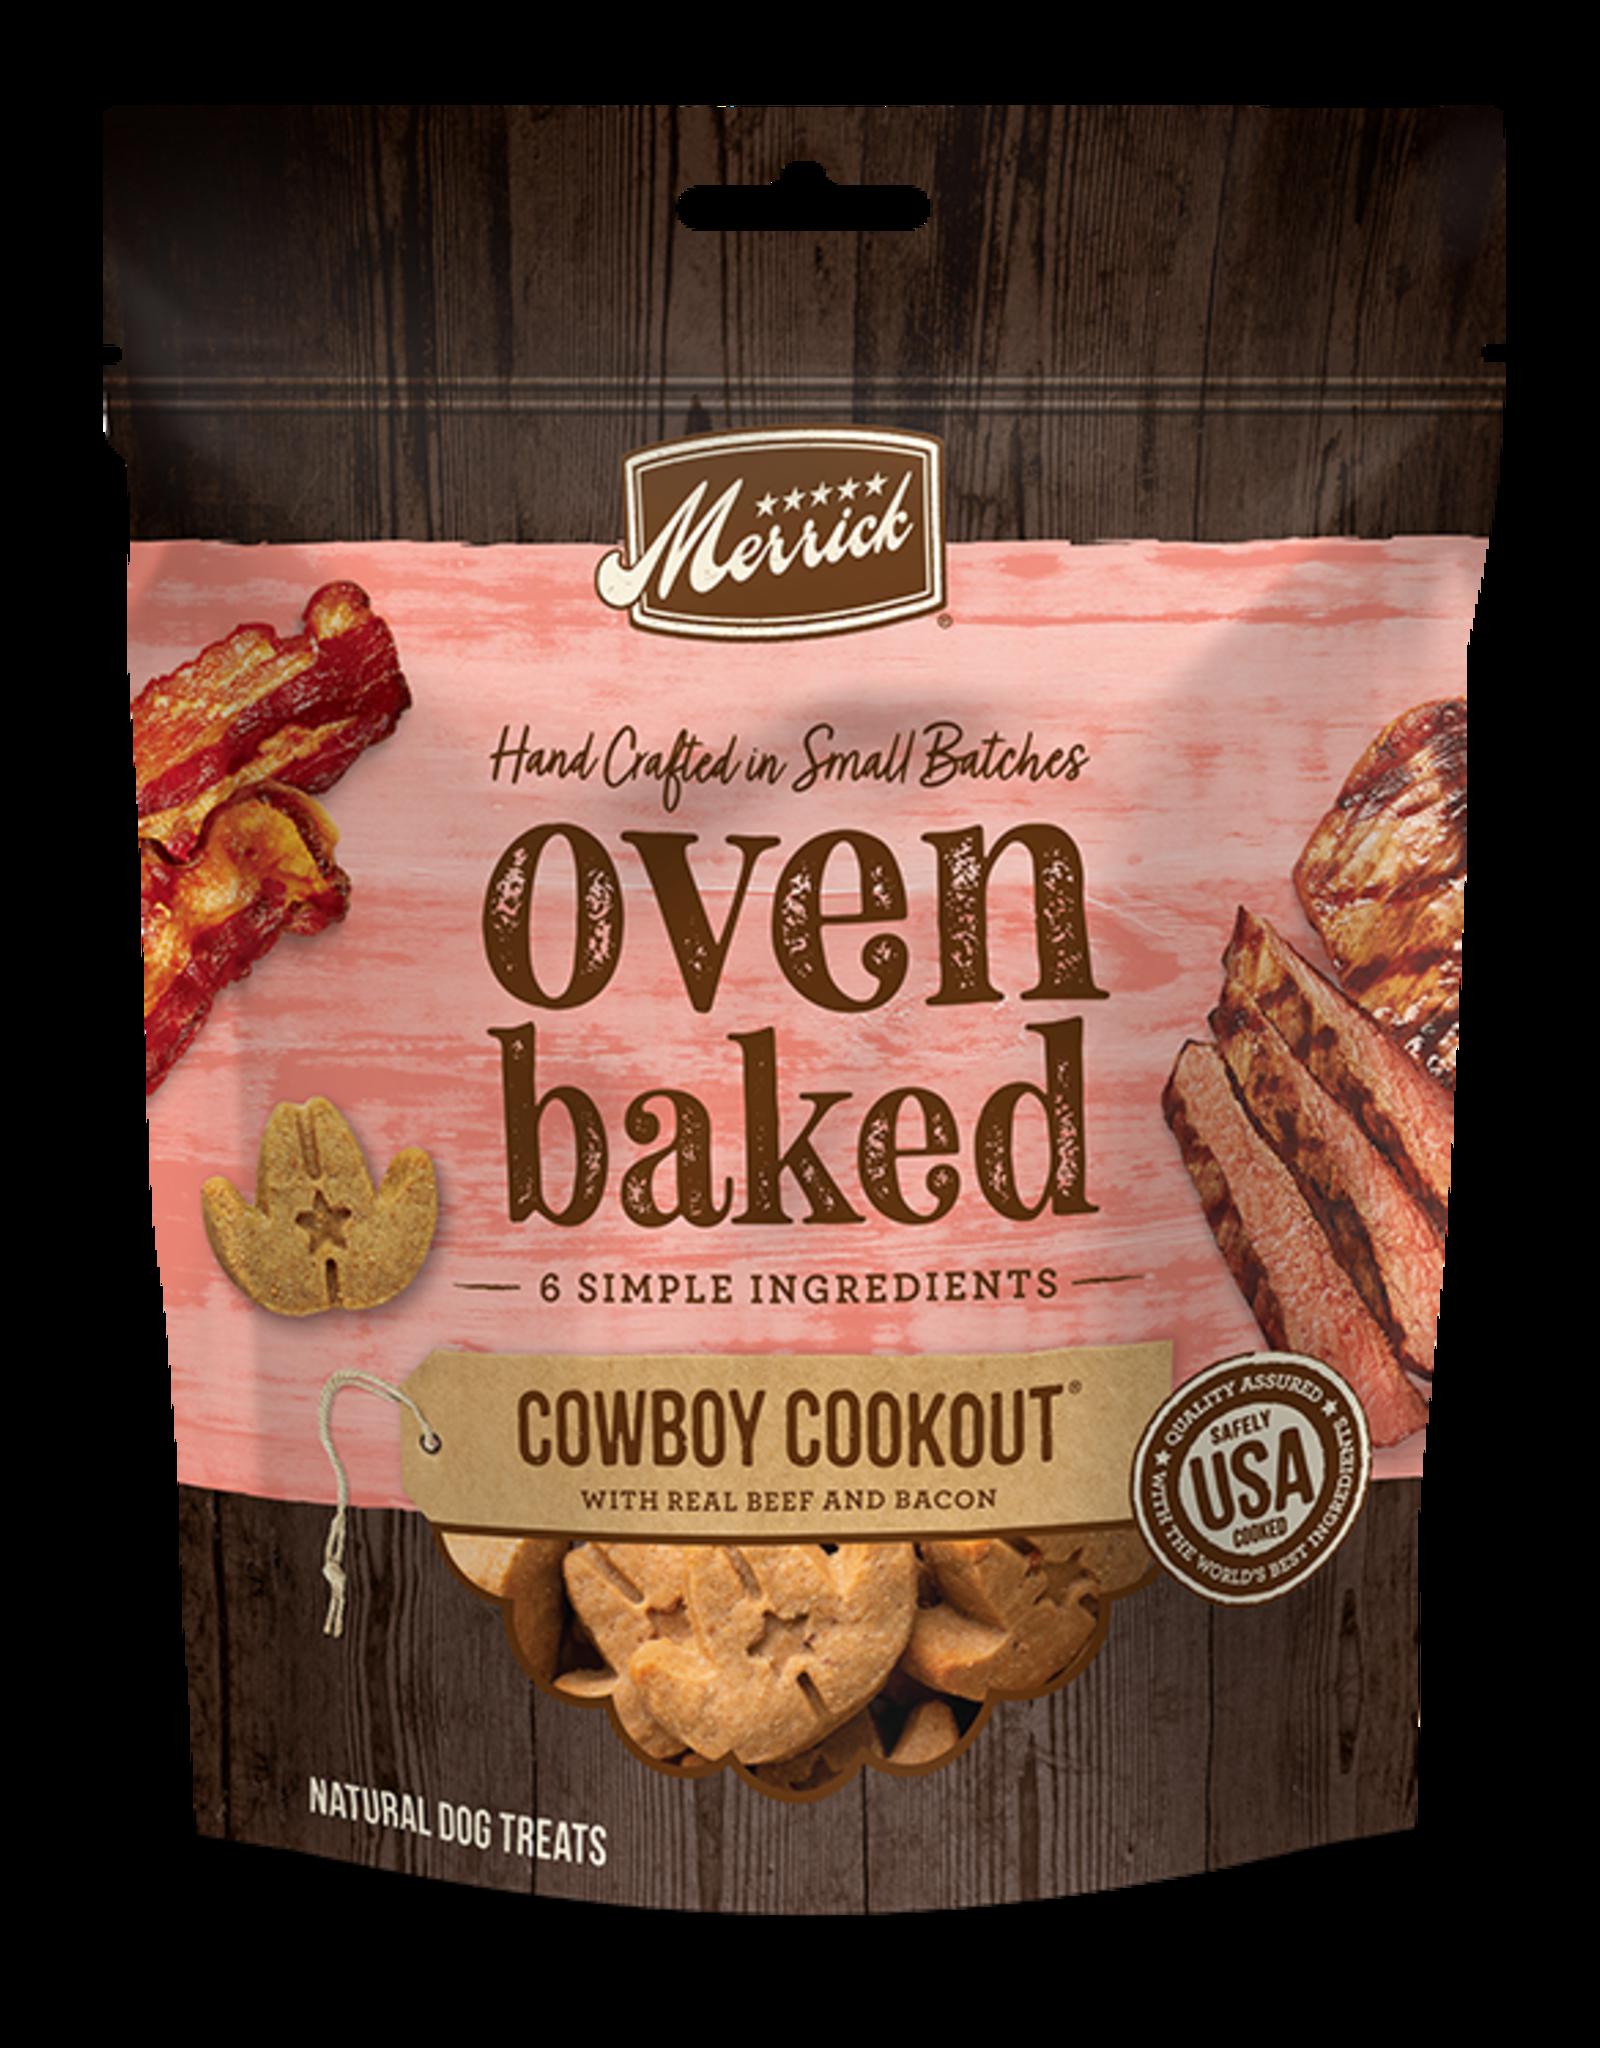 Merrick Oven Baked Cowboy Cookout Treats